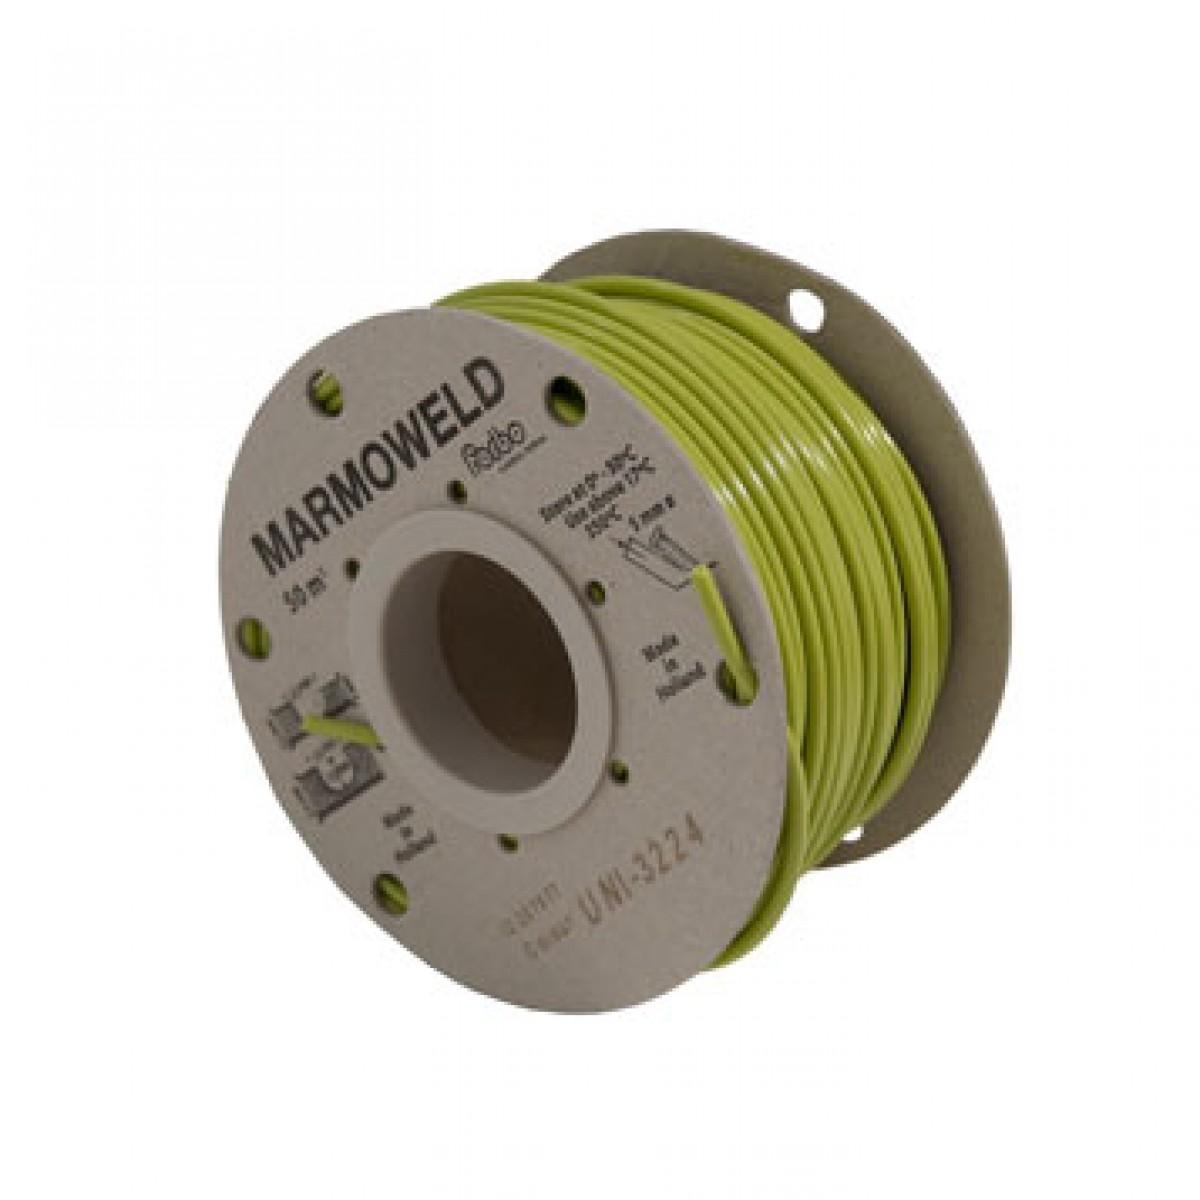 Marmoleum Weld Rod Solid Color